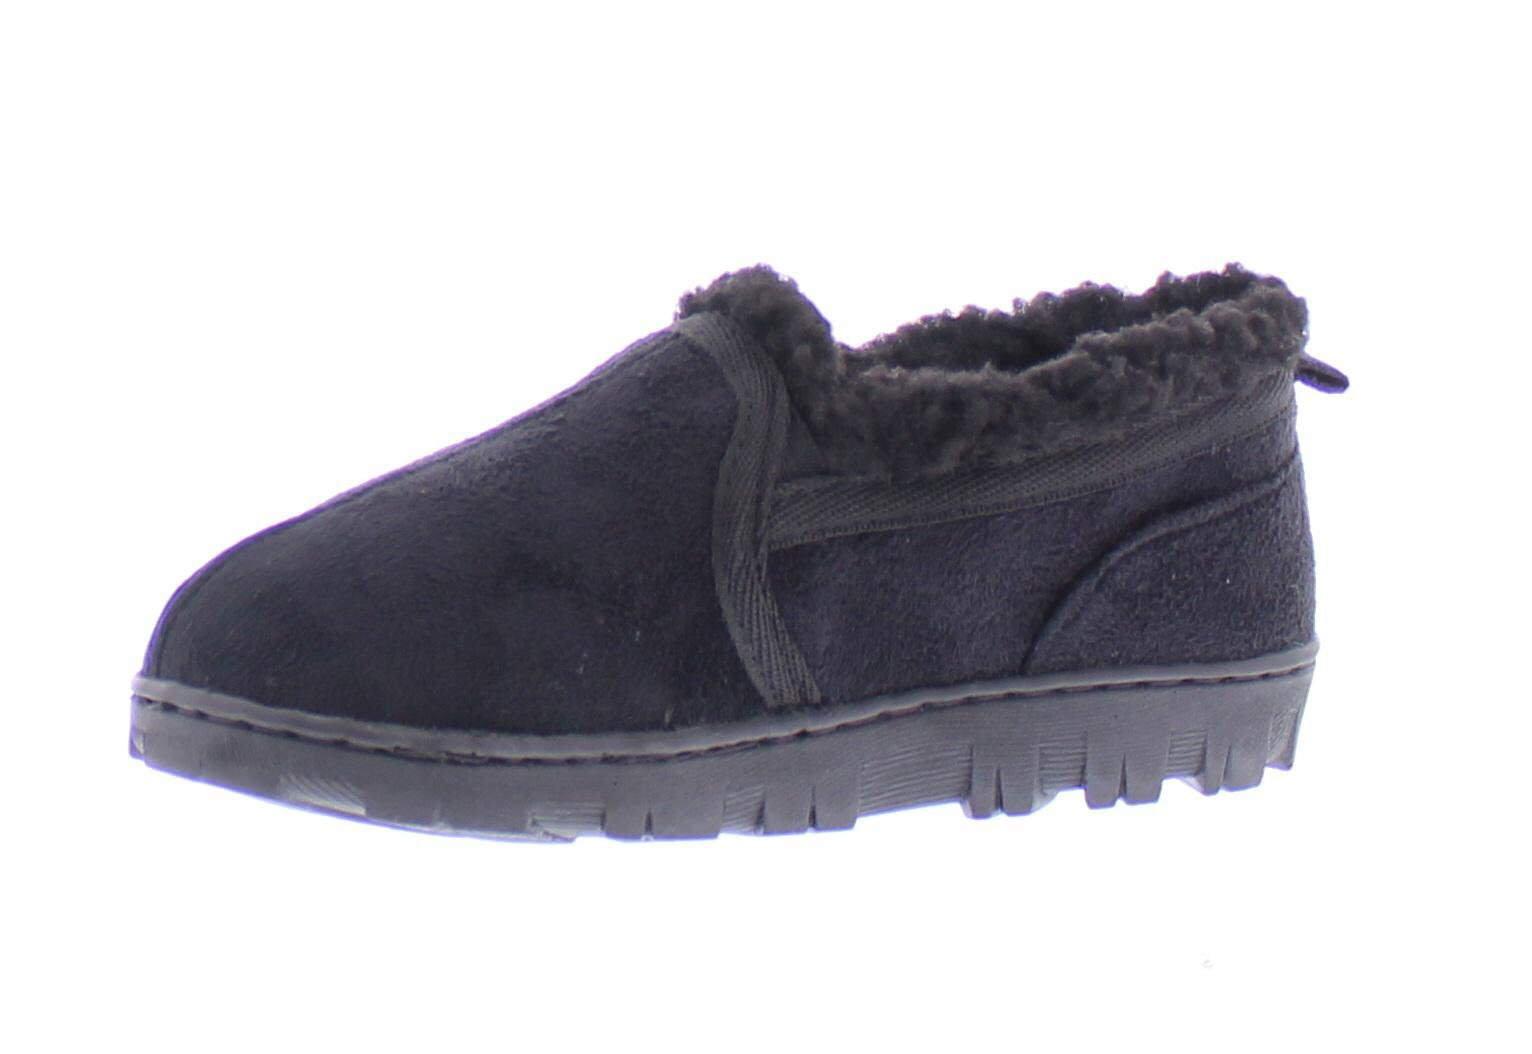 Gold Toe Norman Boy's Memory Foam Slippers Warm Sherpa Fleece Lined House Shoes Casual Slip On Loafers Black S 11-12